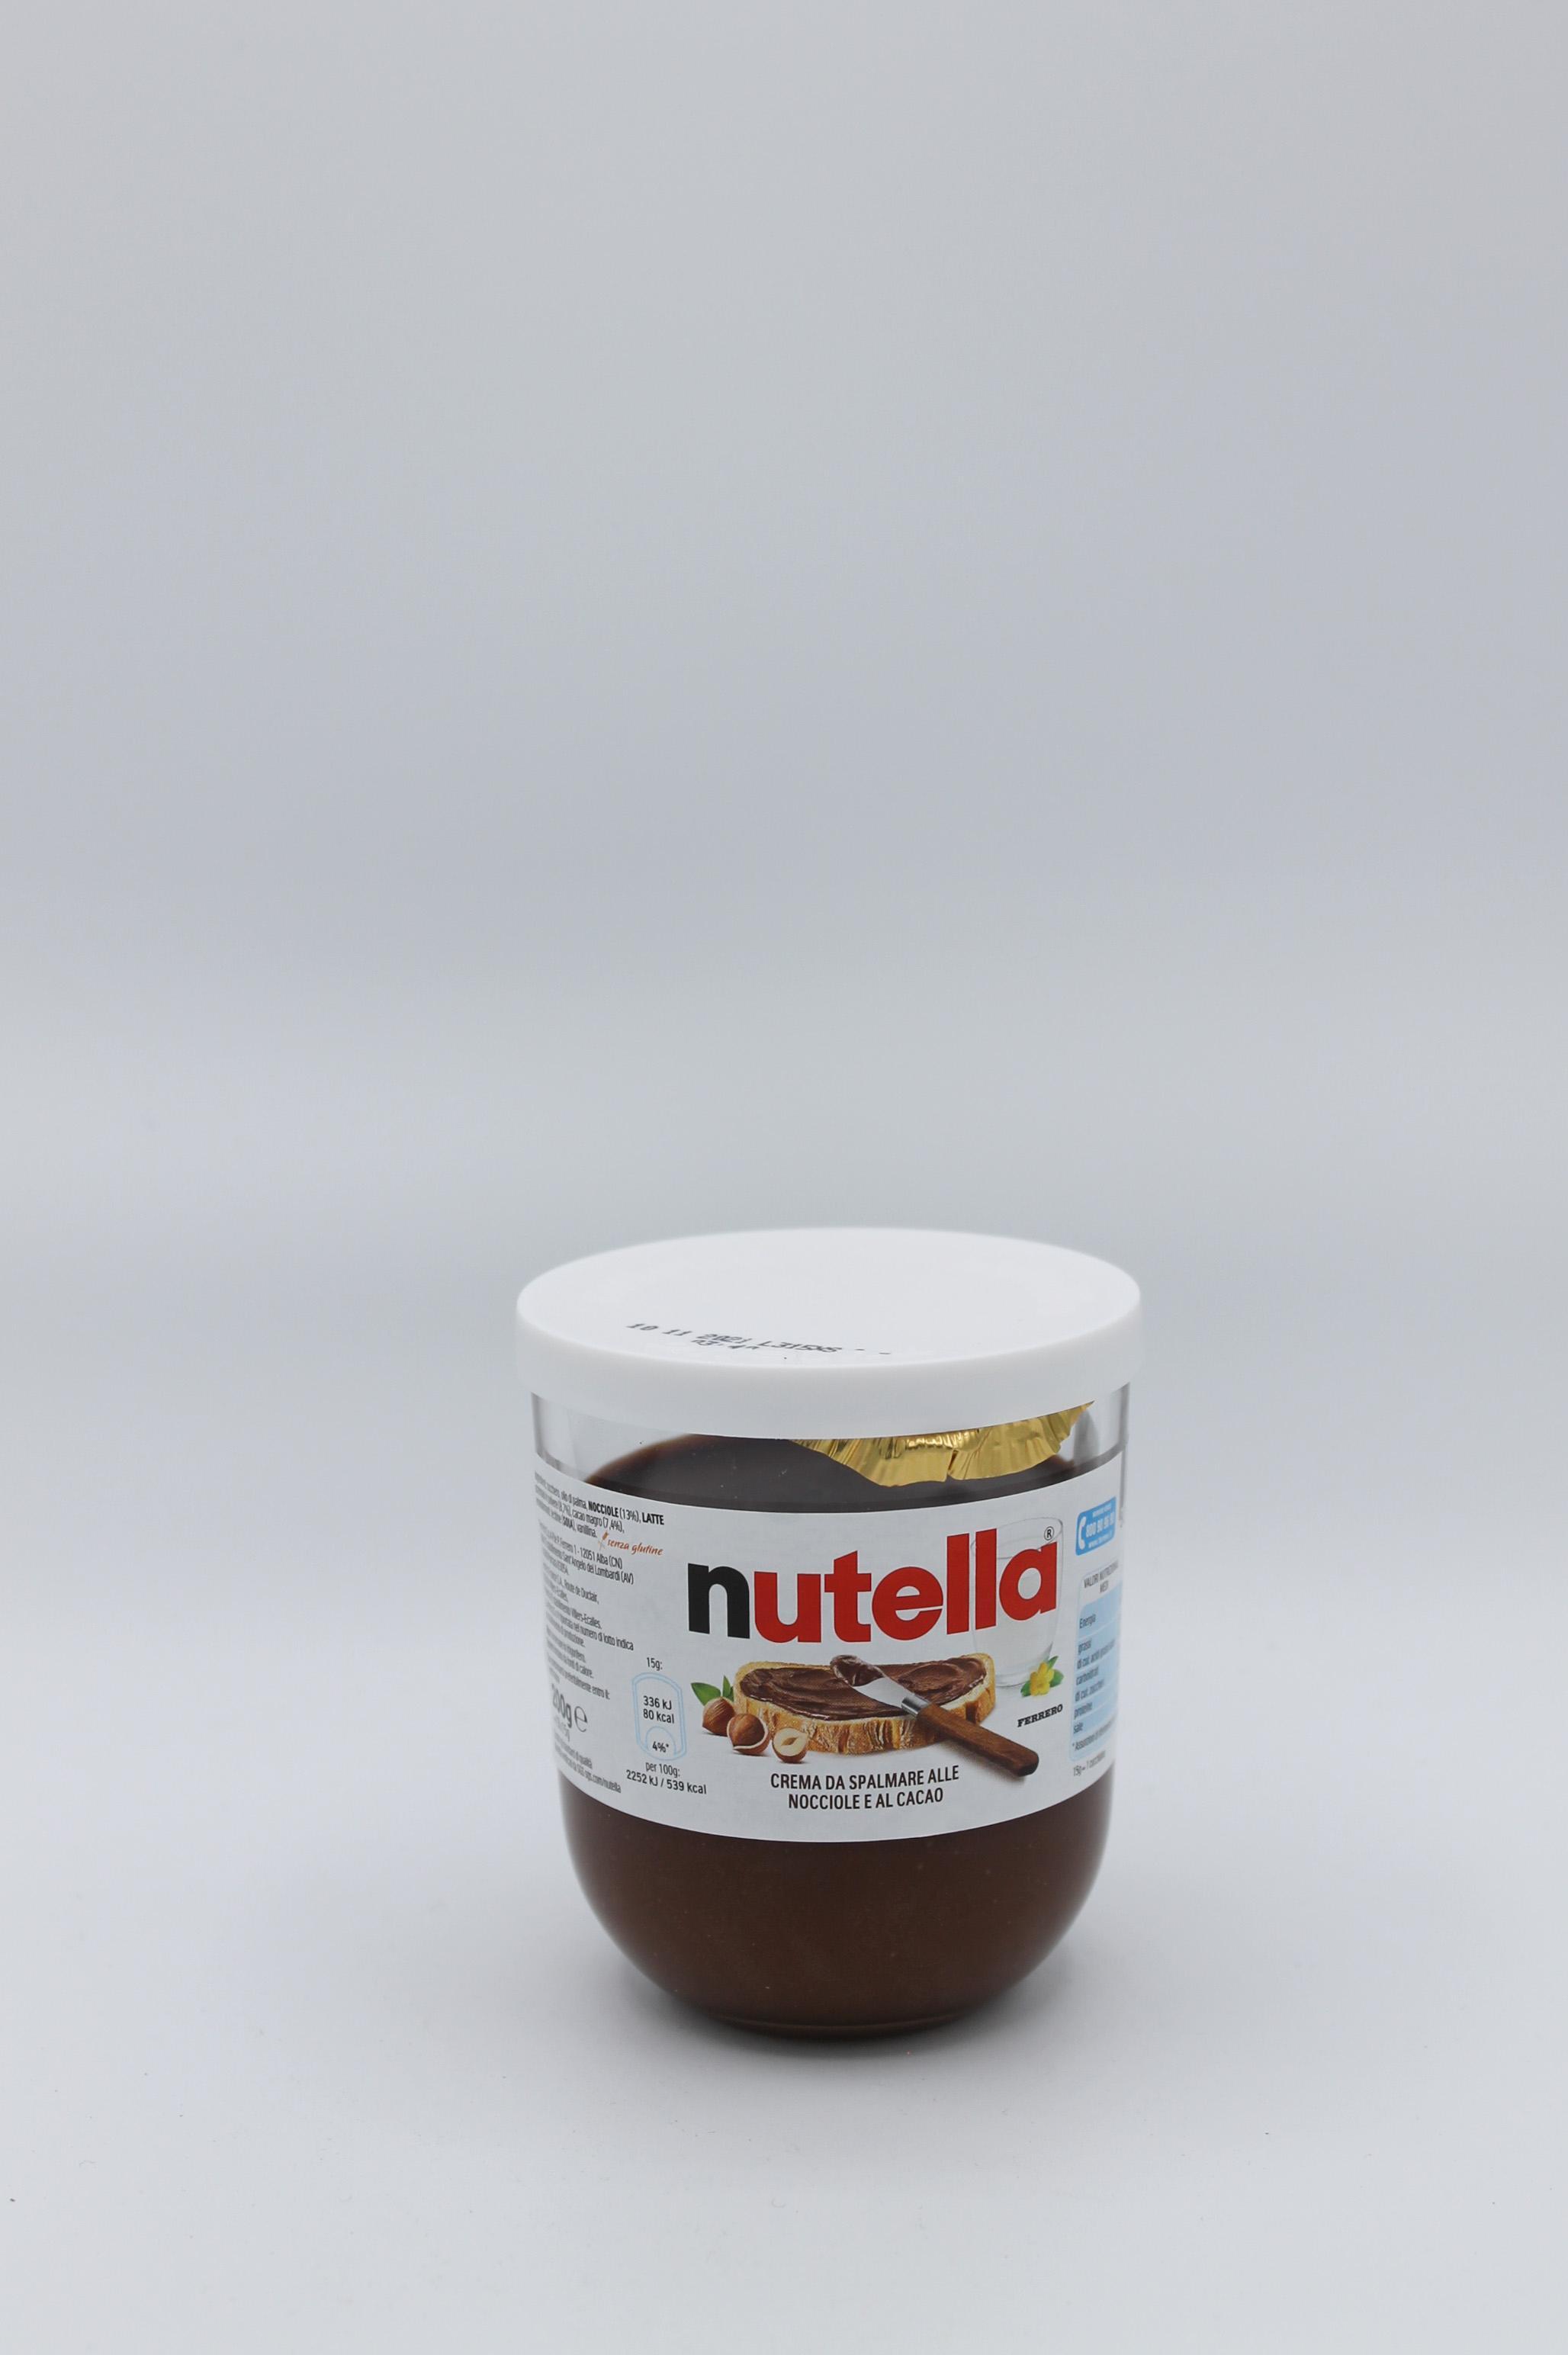 Ferrero nutella 200 gr.